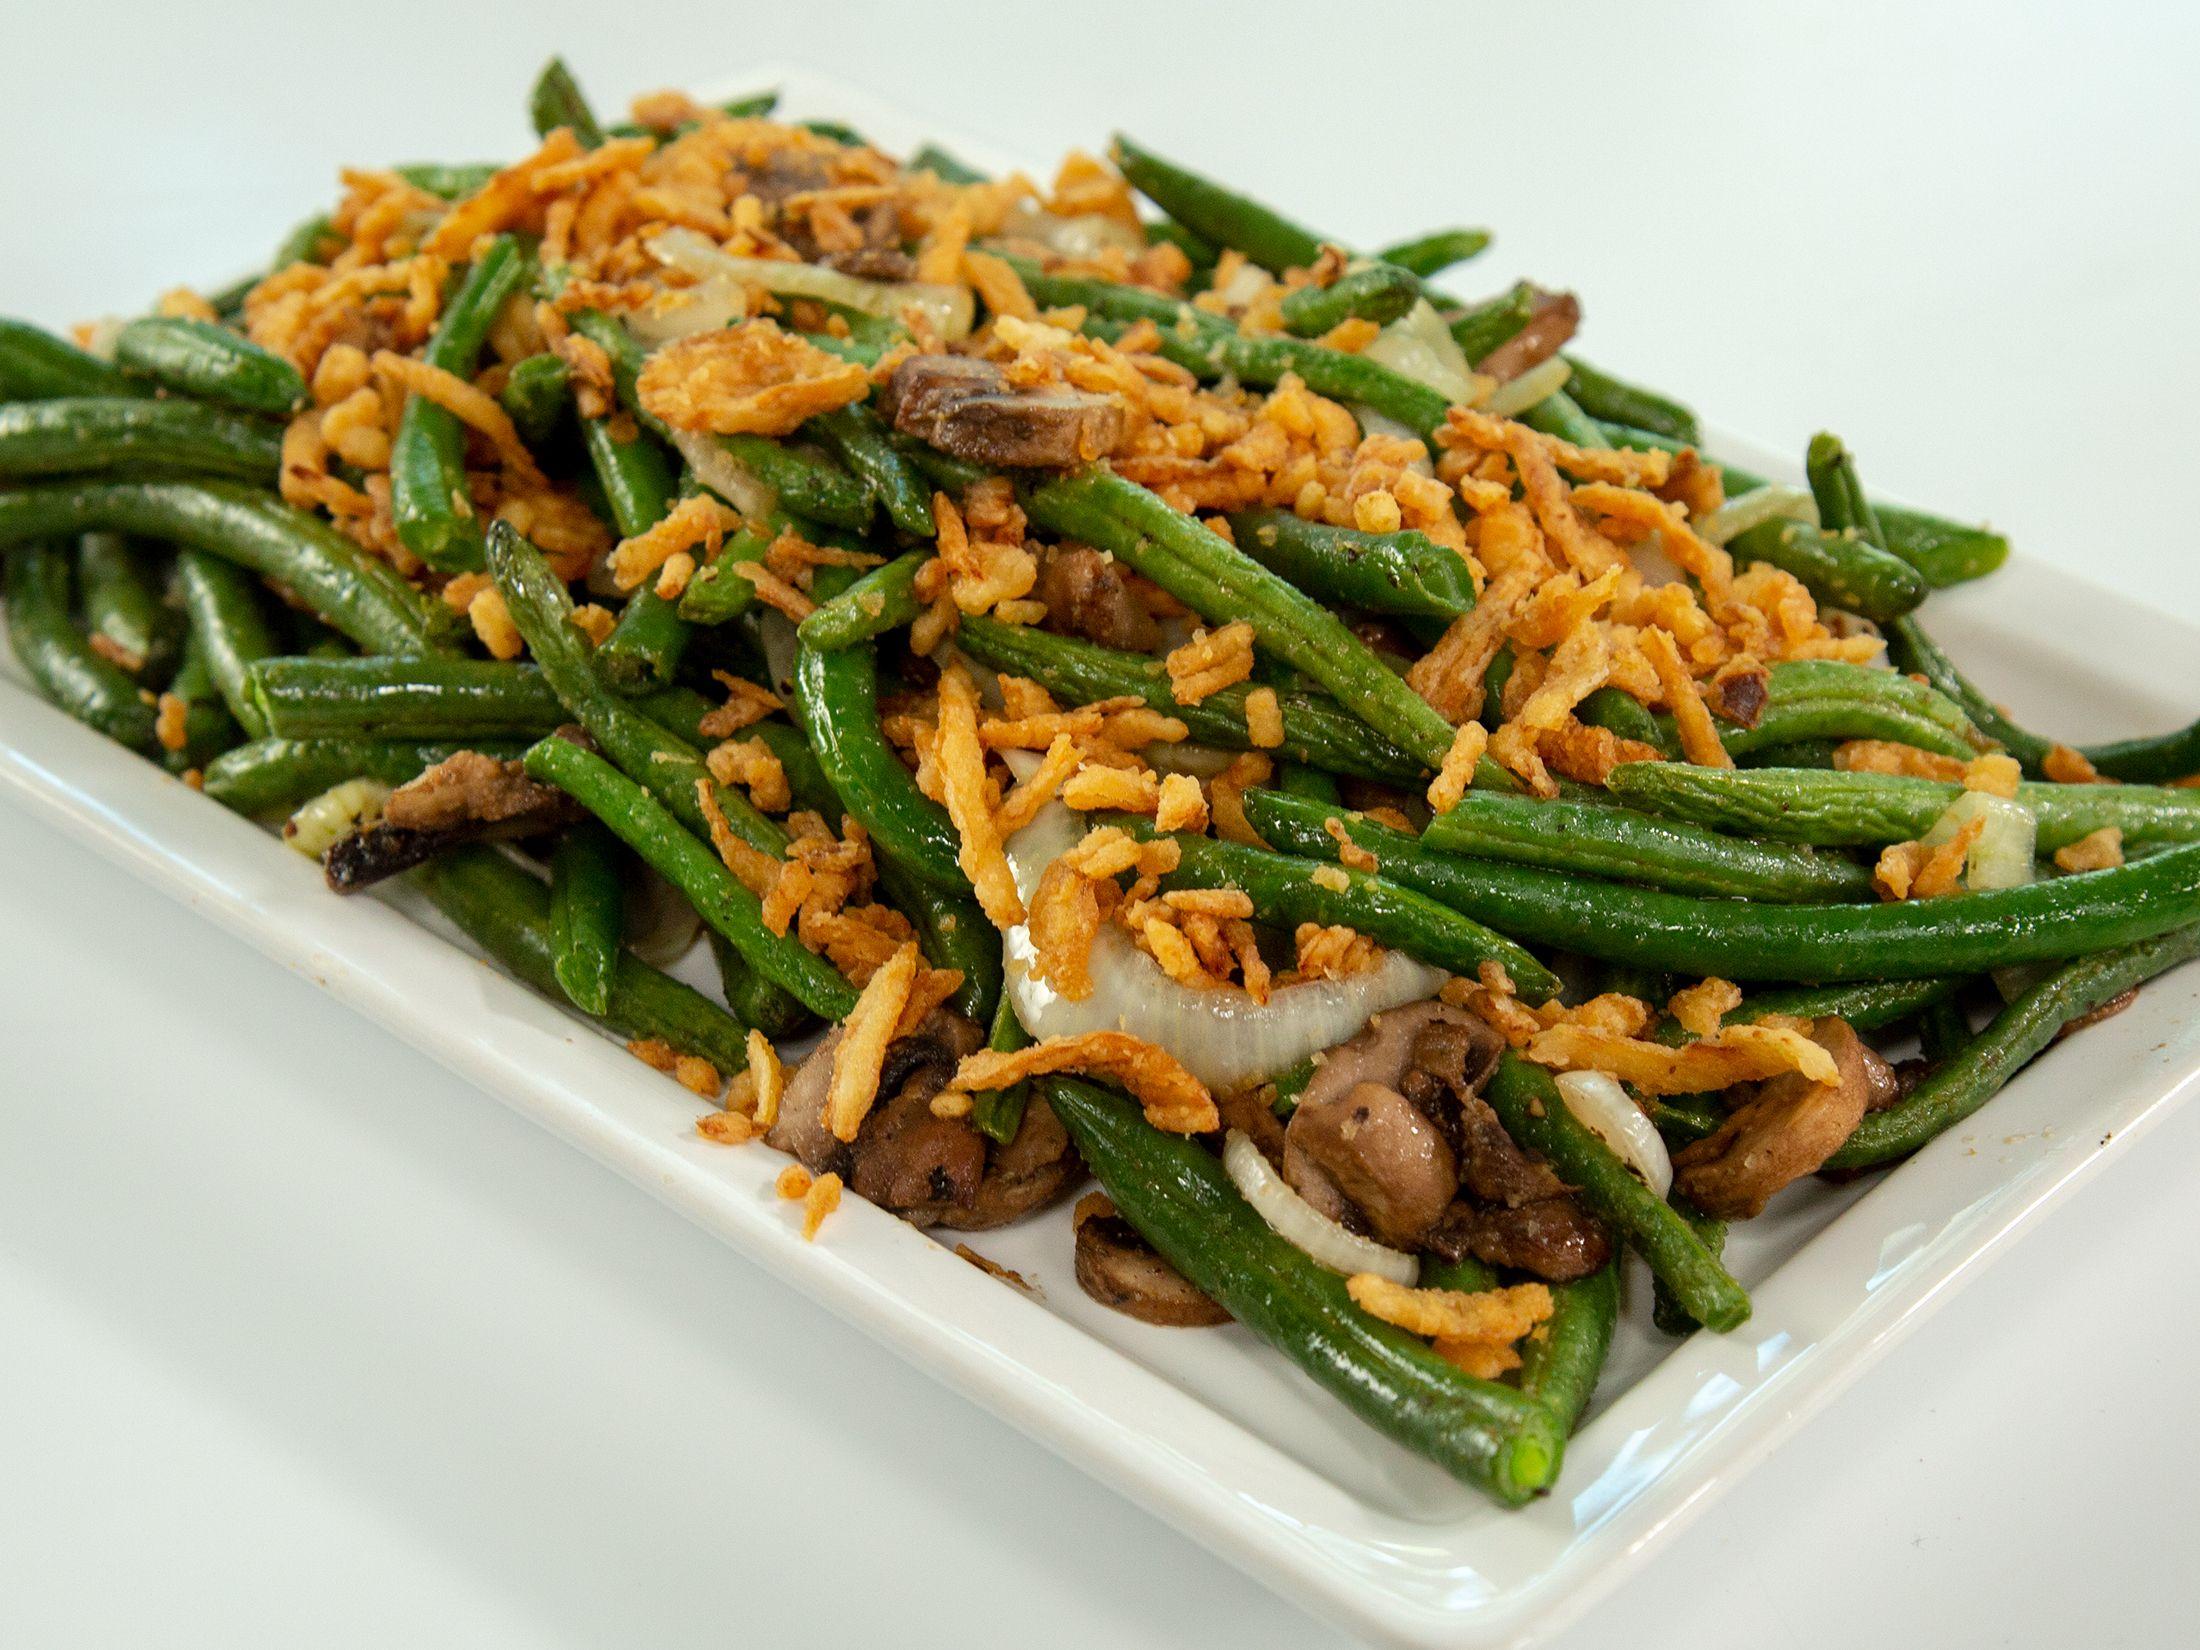 Air Fried Green Bean Casserole Air fried green beans